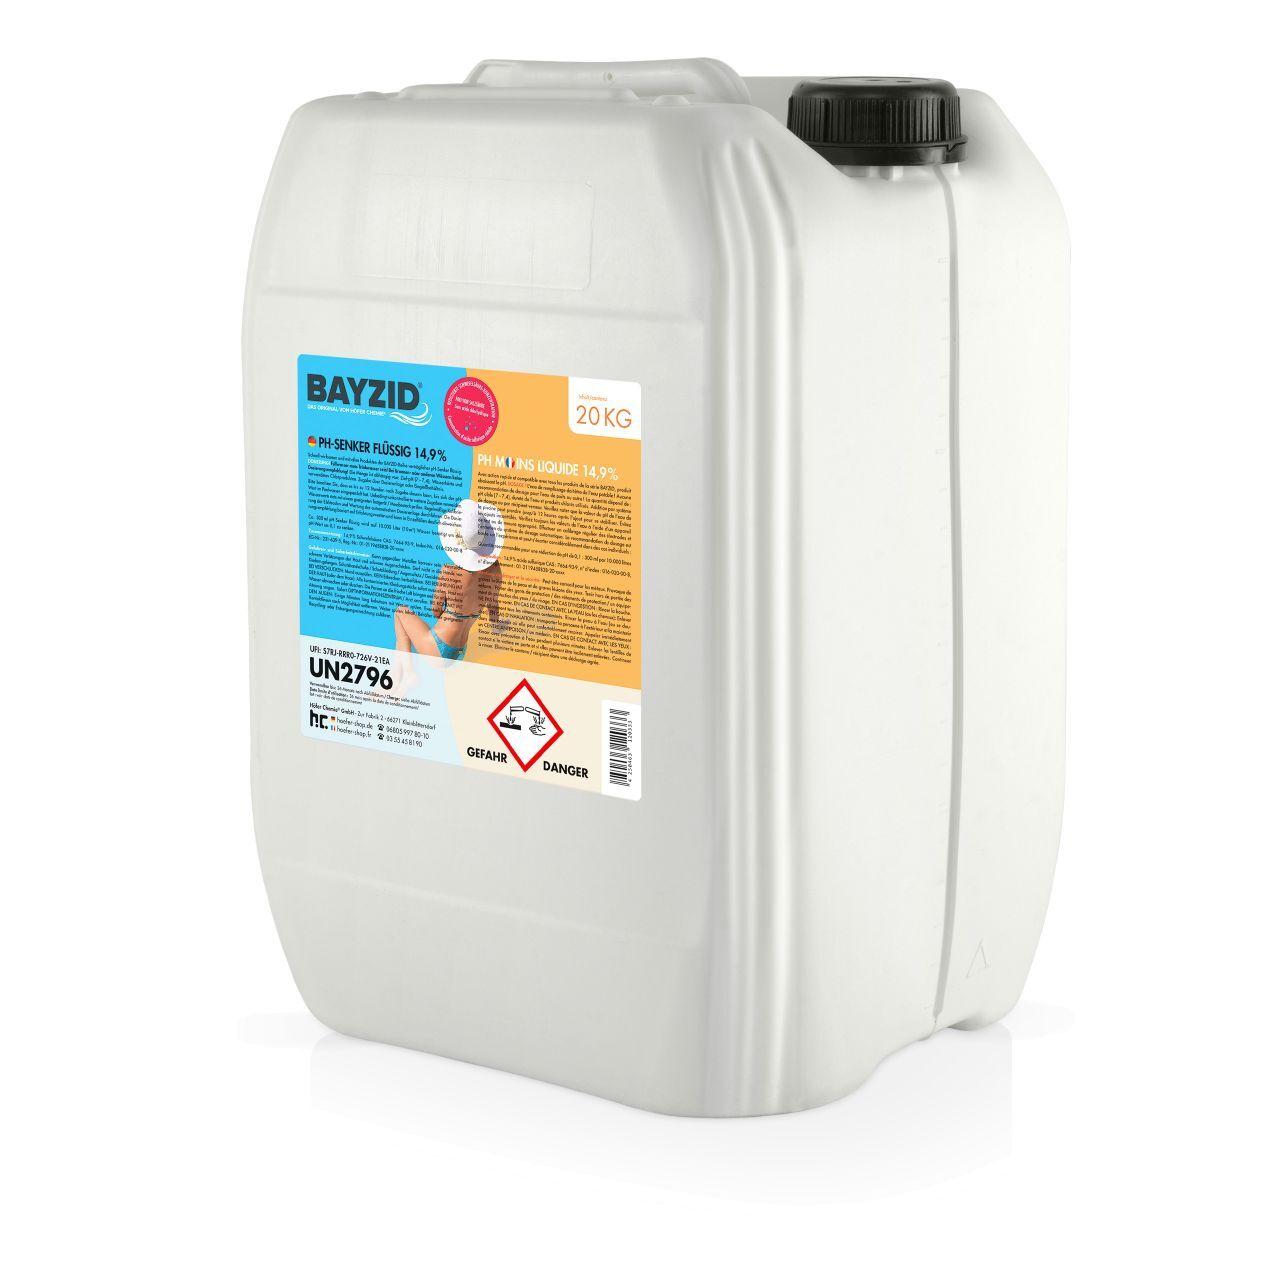 BAYZID 40 kg pH moins liquide (2 x 20 kg)